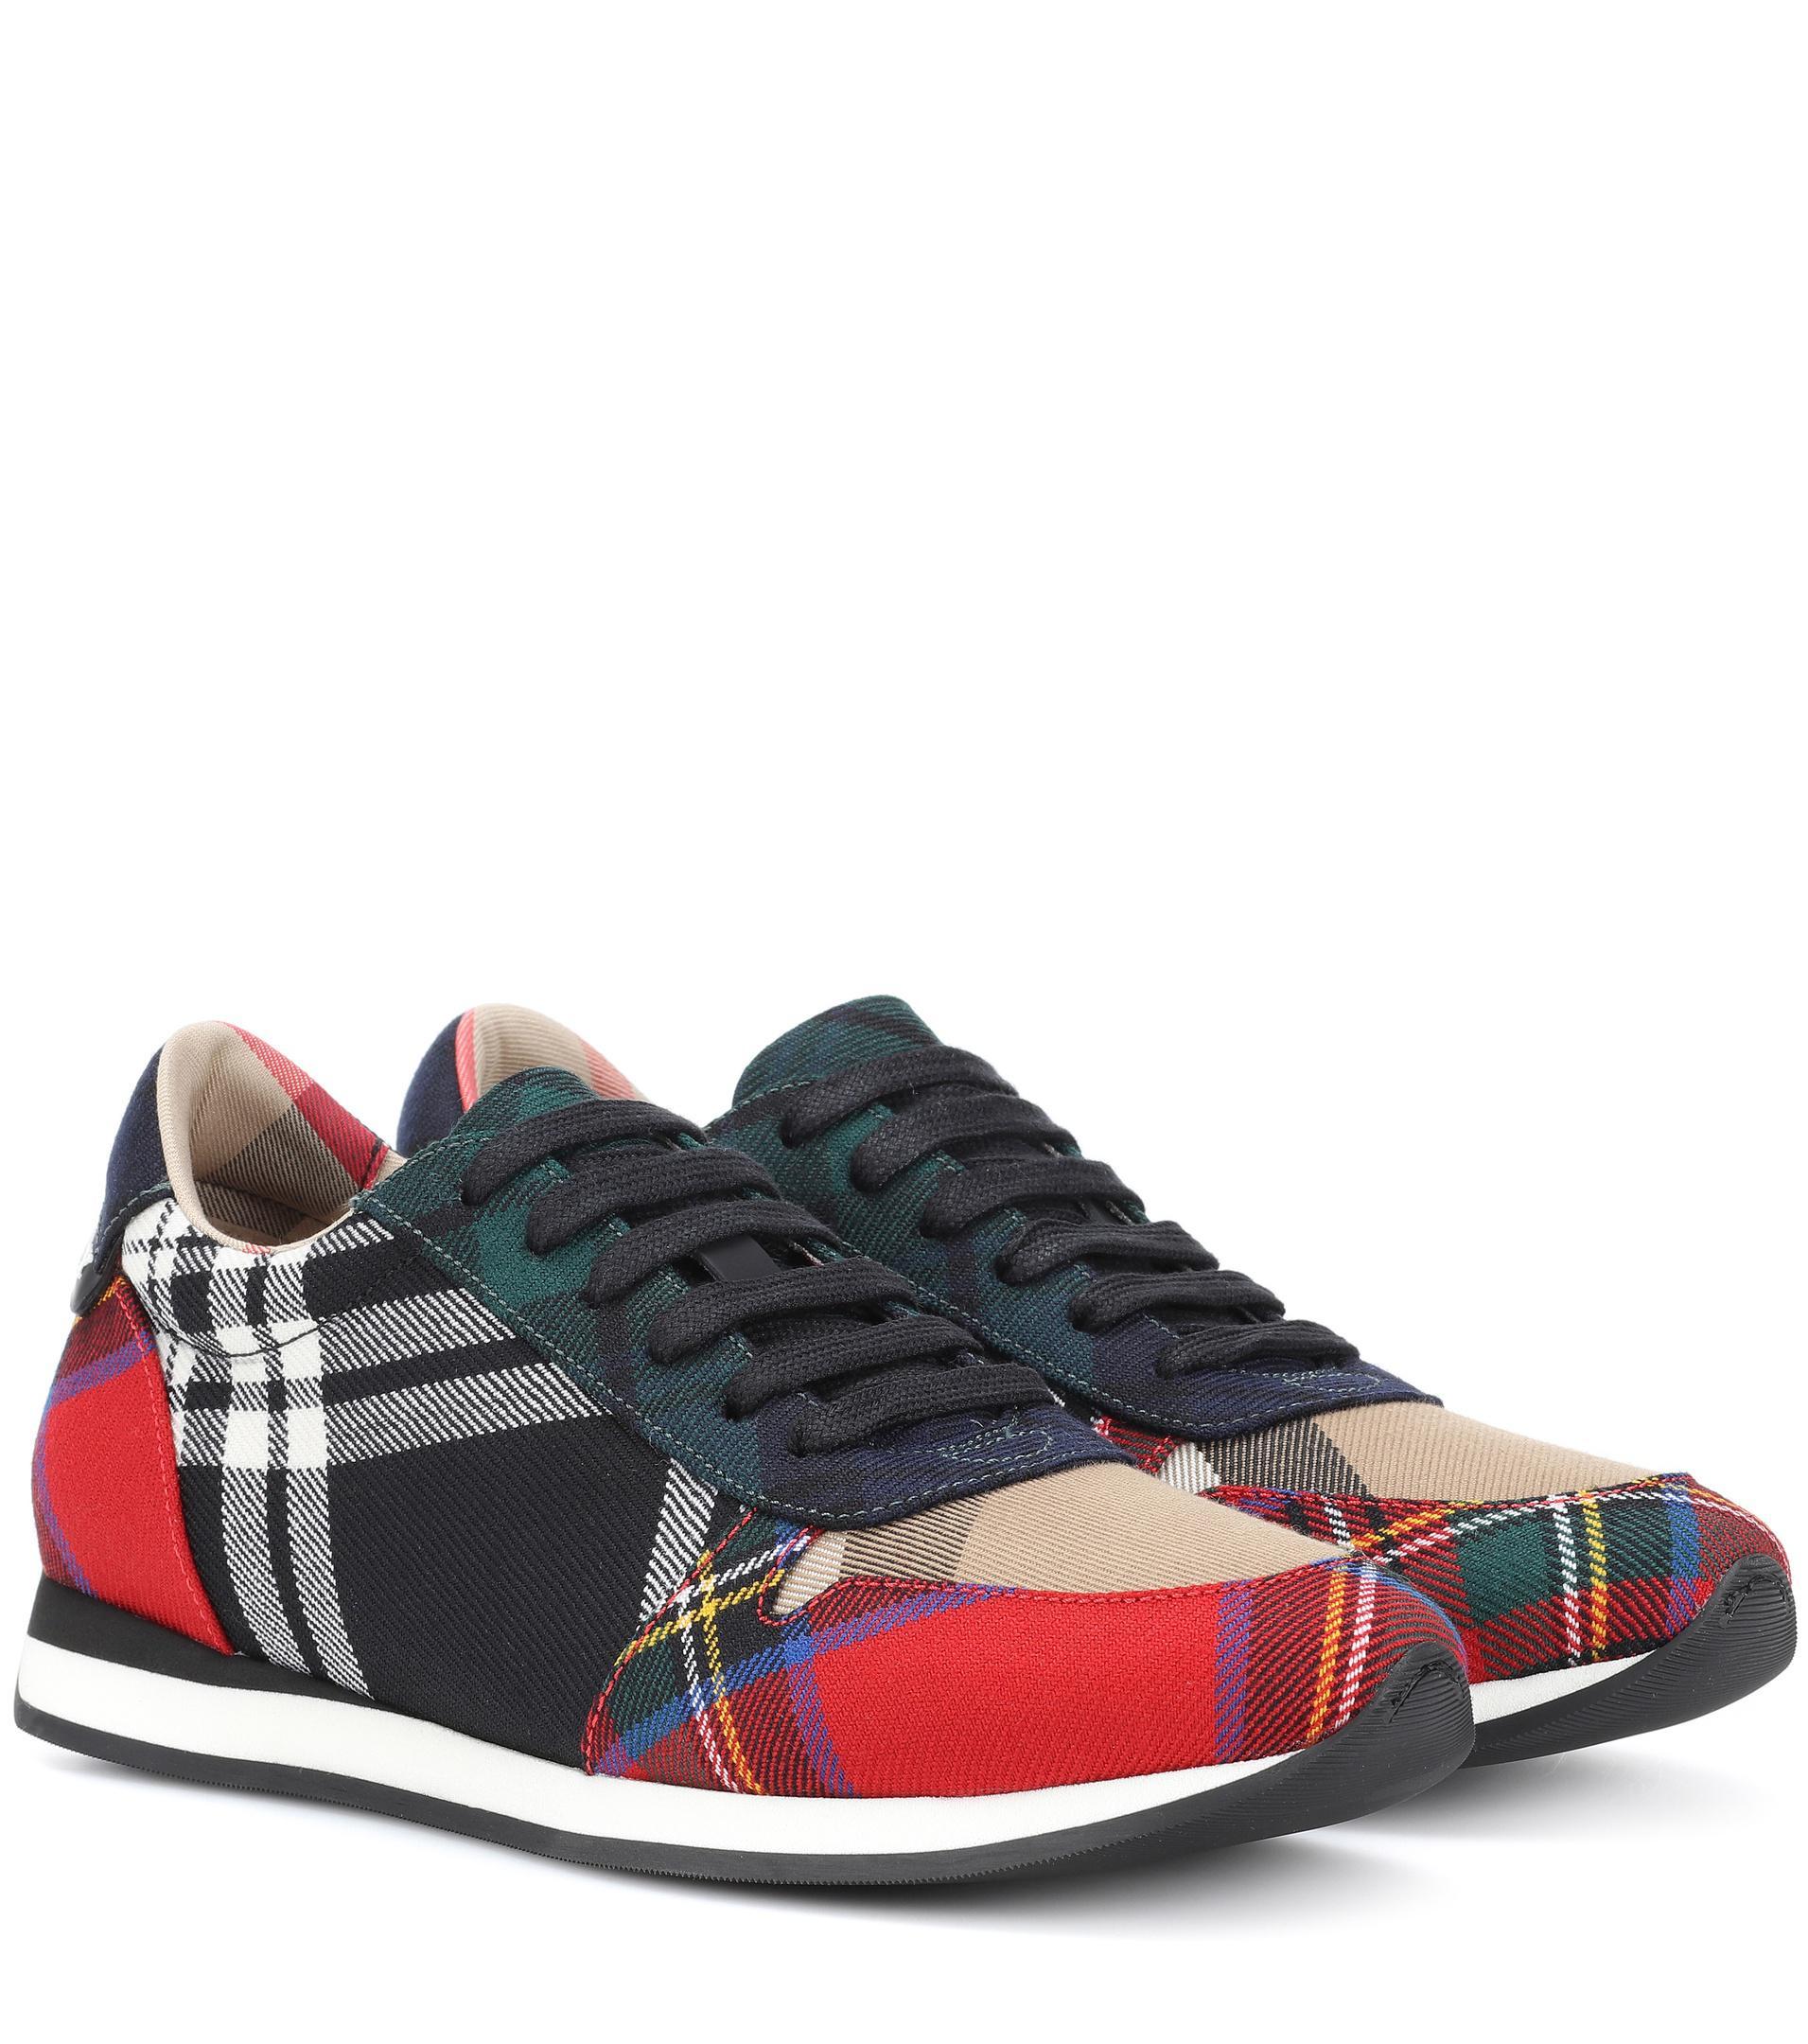 Burberry Amelia Tartan Wool Sneakers - Lyst